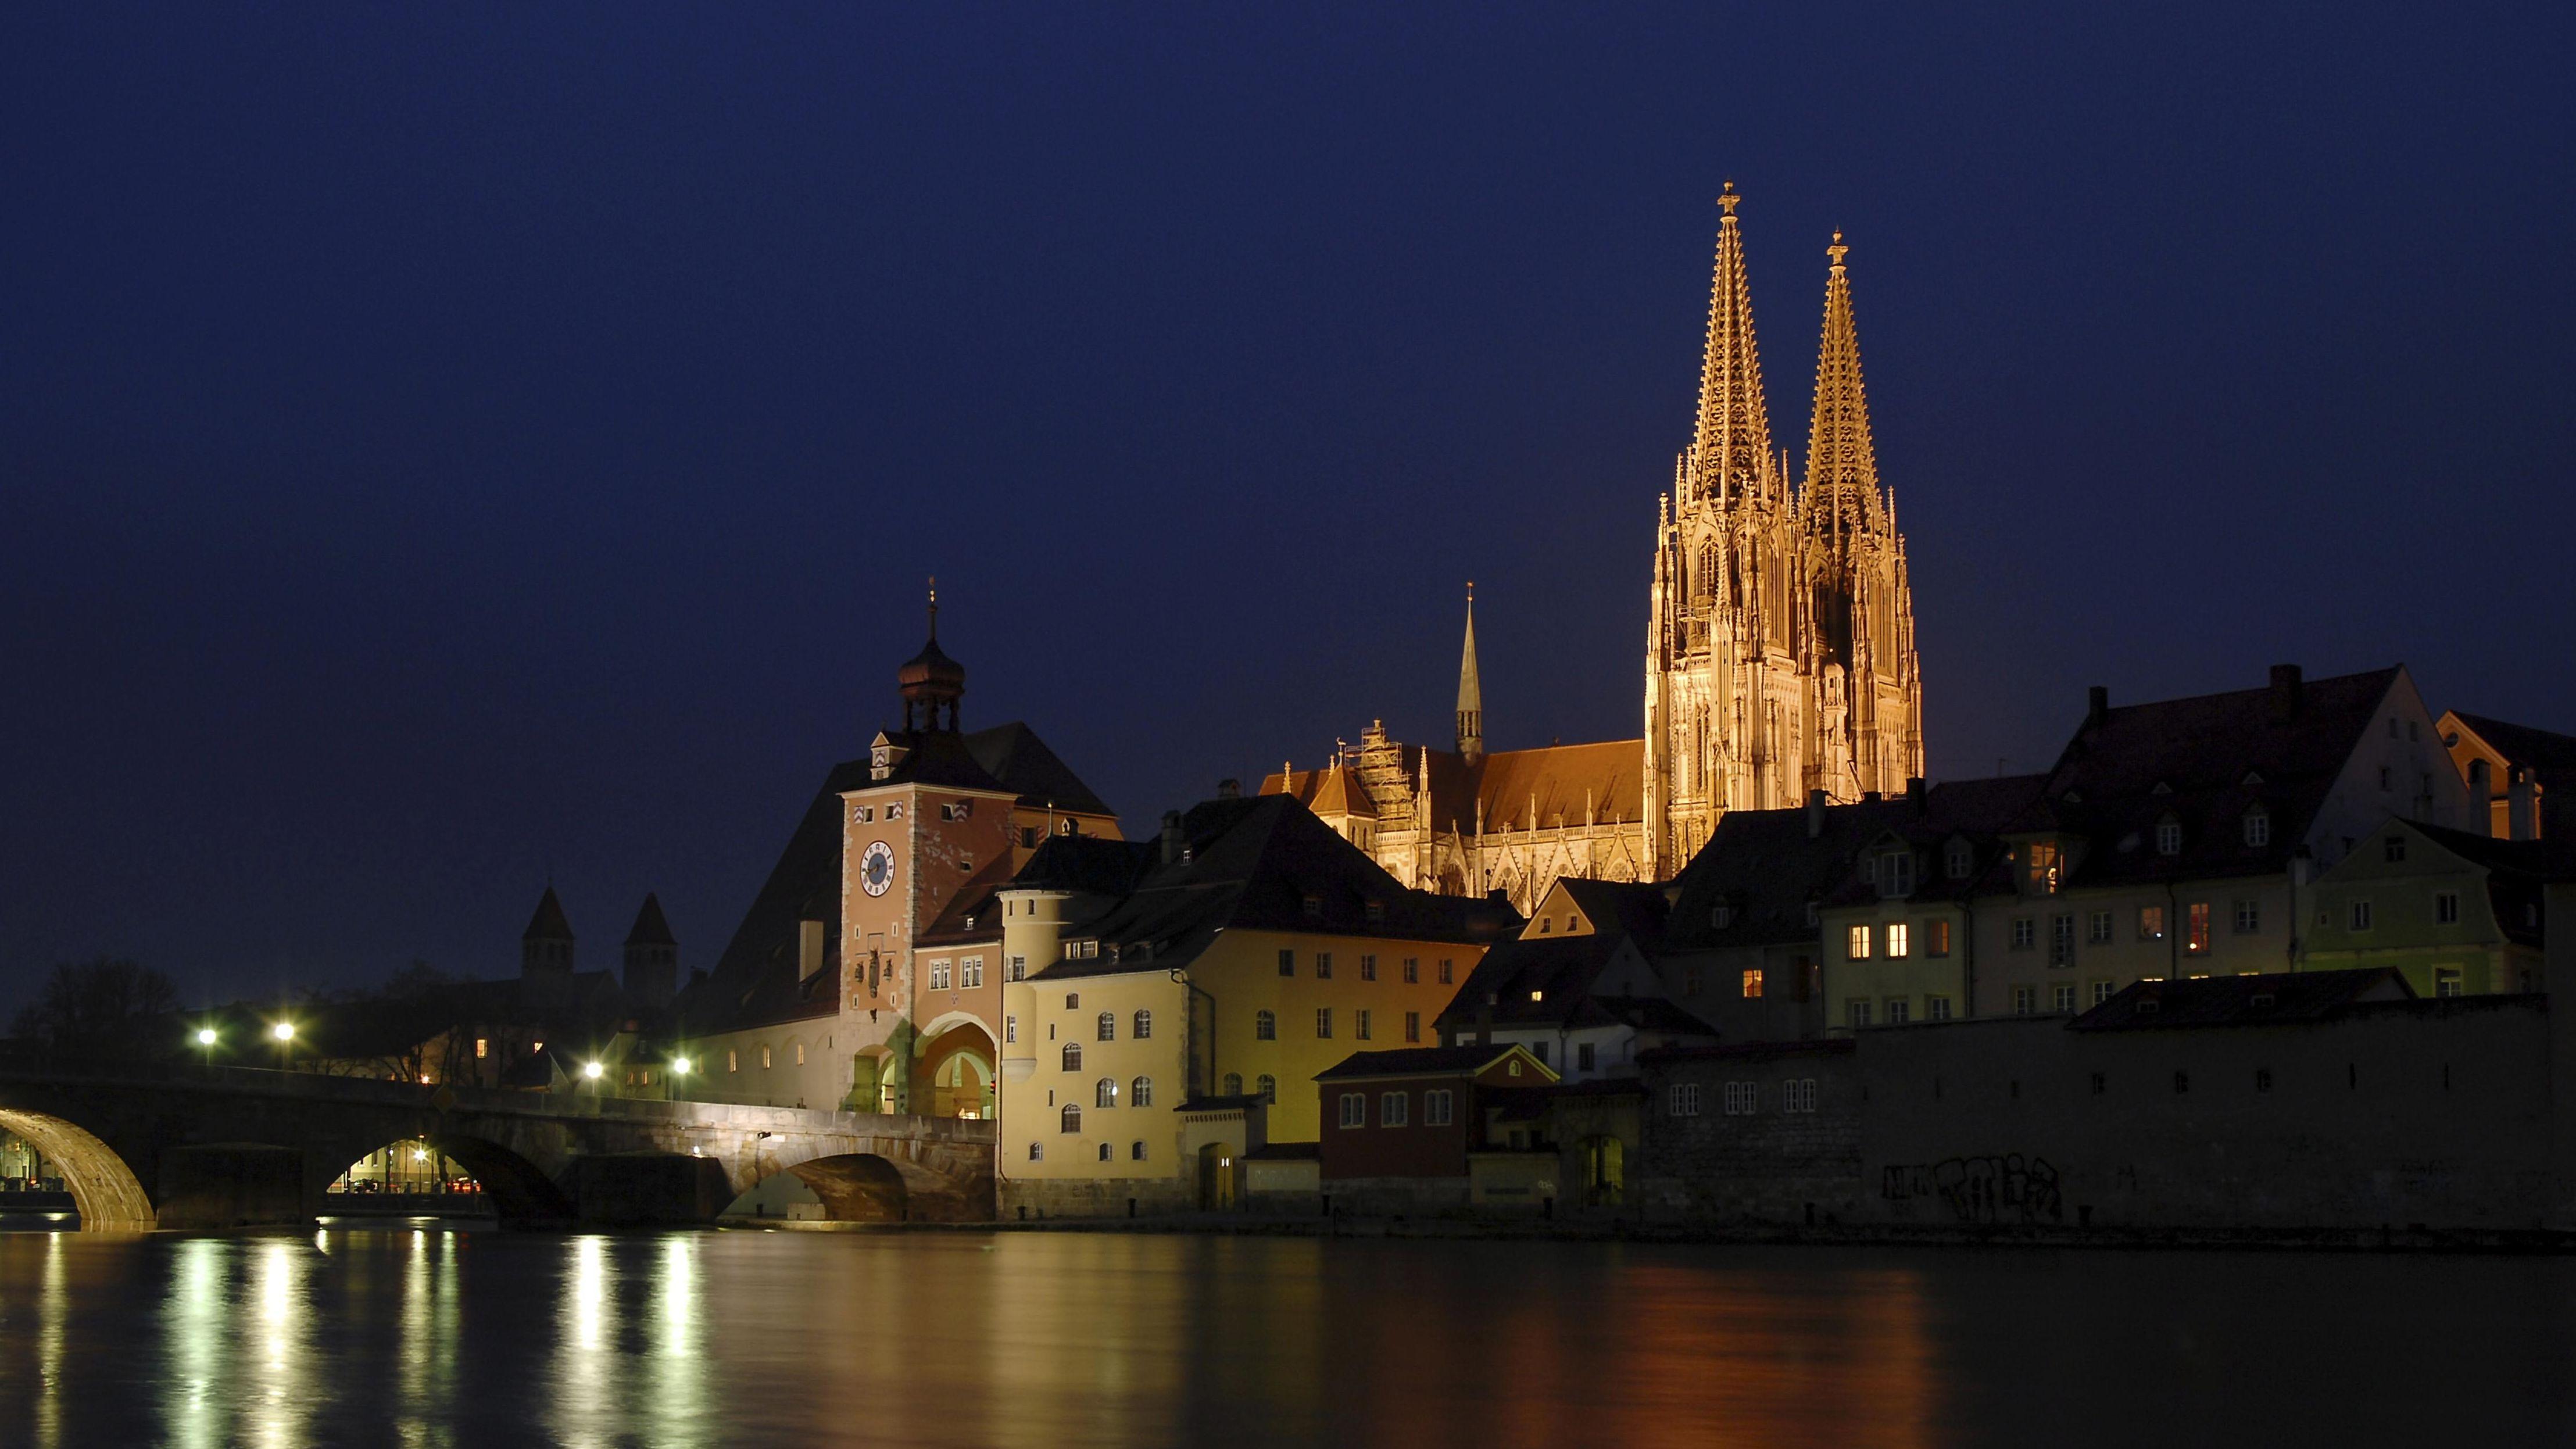 Beleuchtete Türme des Regensburger Doms